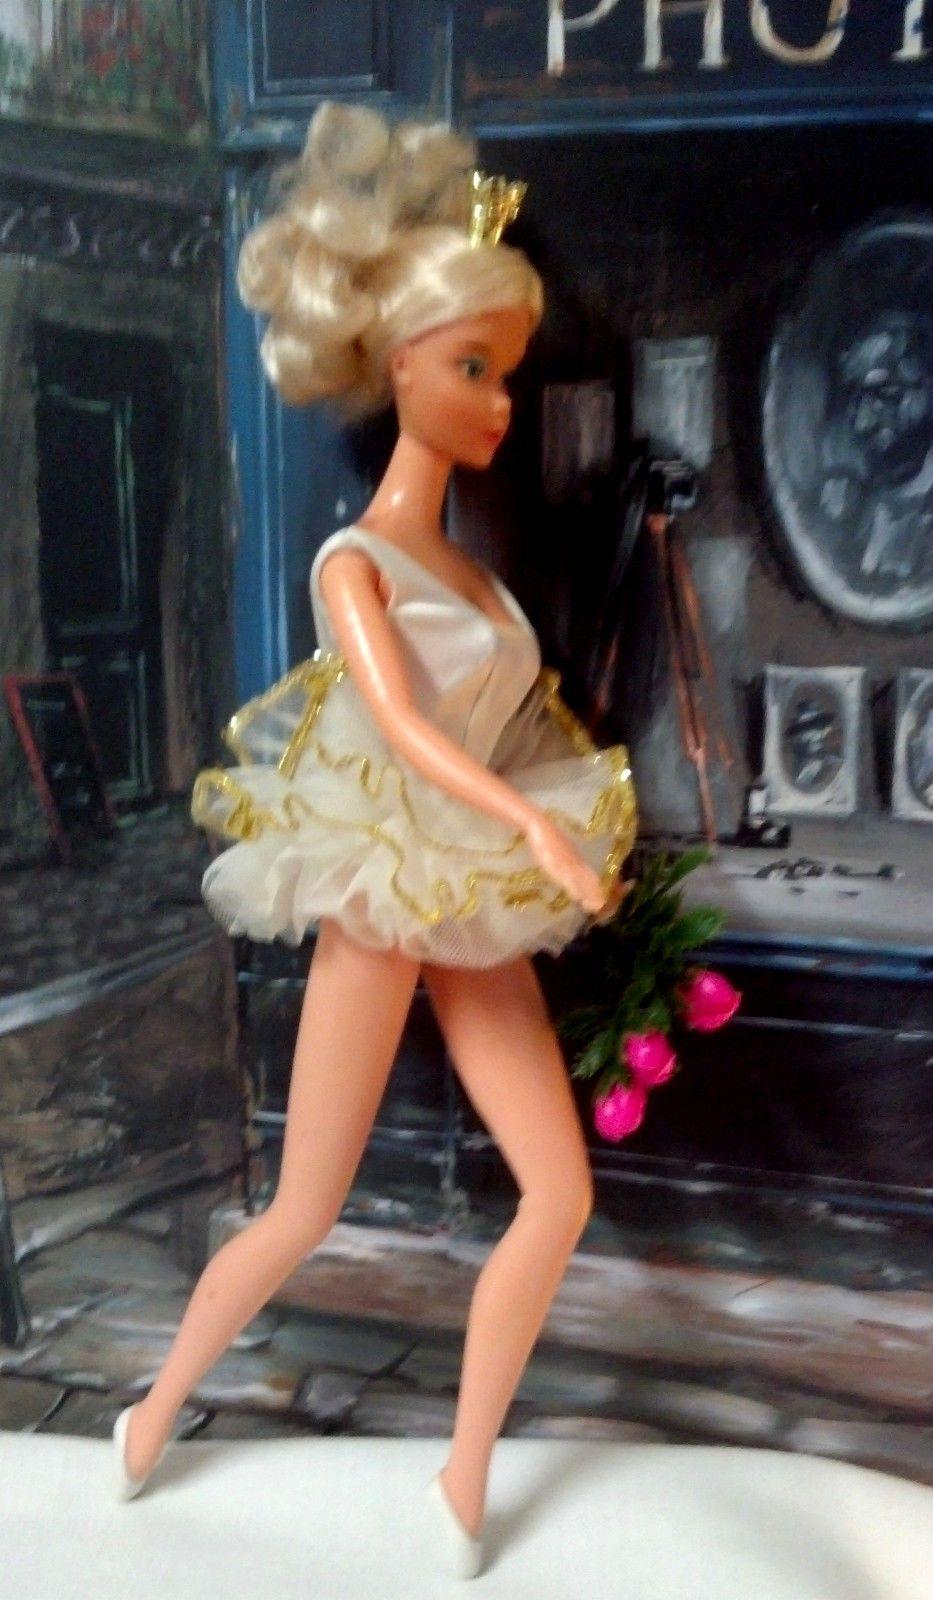 Details about #9093 Vintage Ballerina Barbie doll 1976 USED